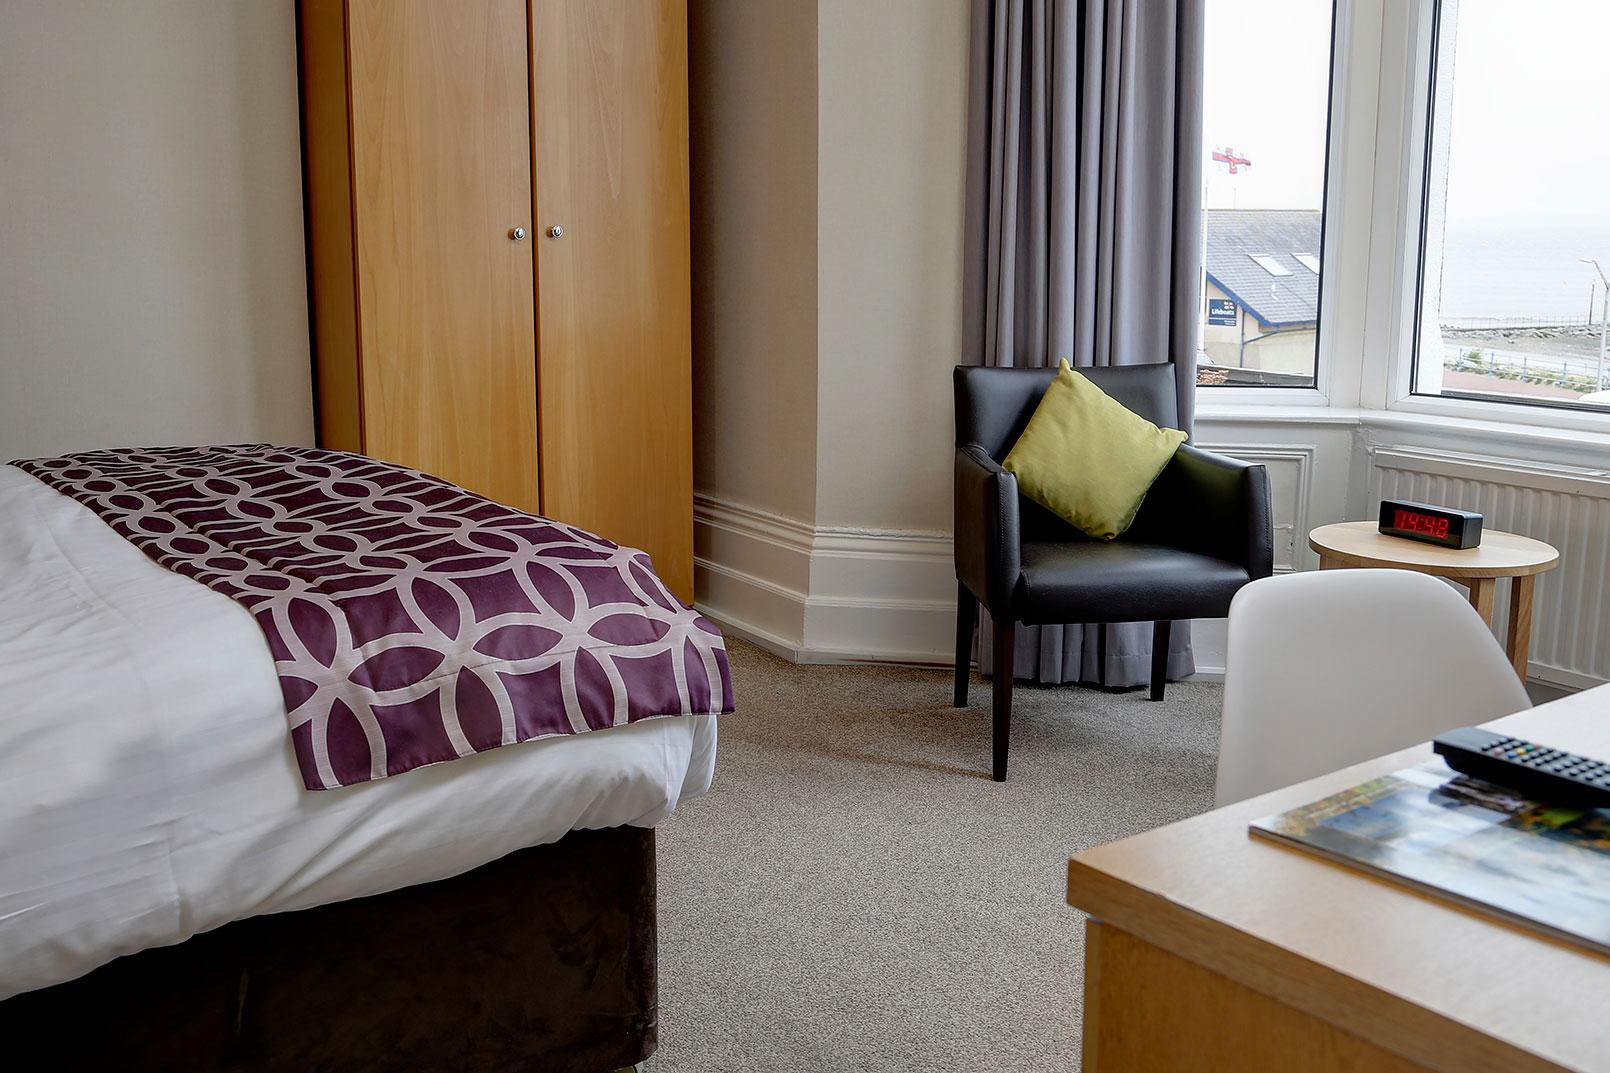 Best Western Lancaster Morecambe Lothersdale Hotel | 320-323 Marine Road, Morecambe LA4 5AA | +44 1524 416404